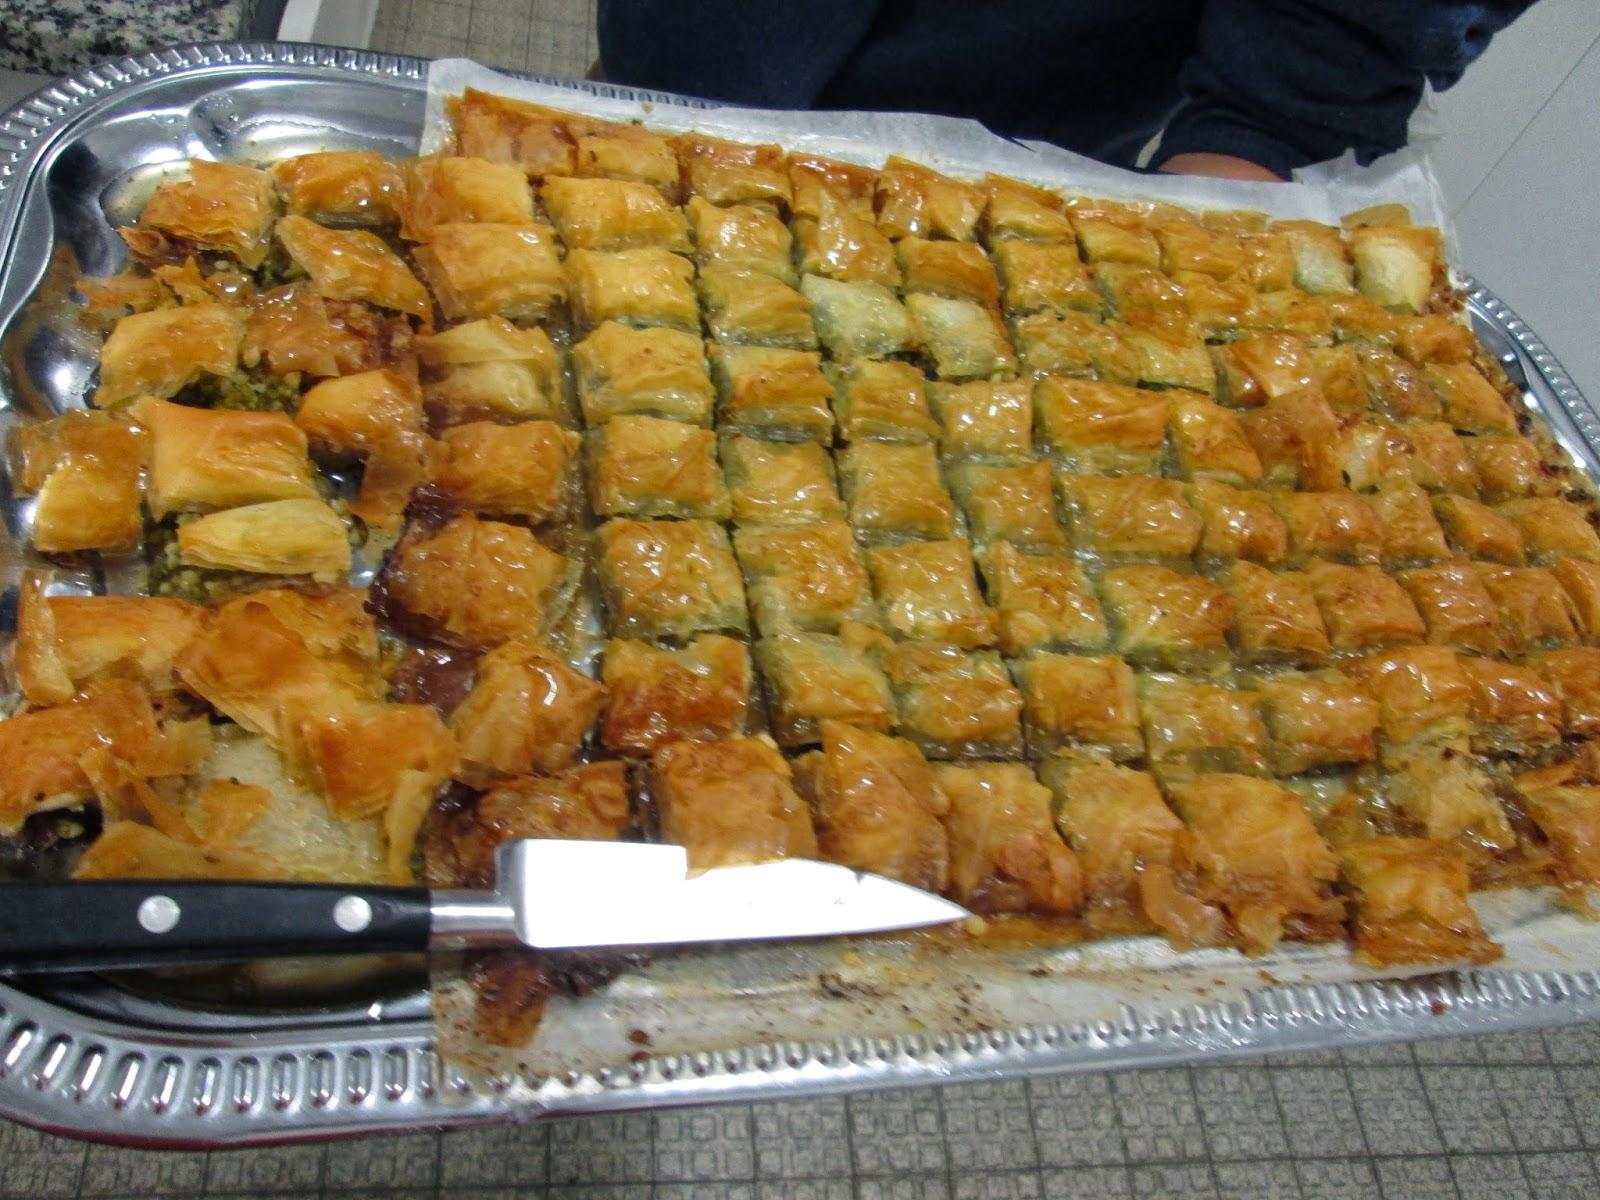 Recette baklawa tunisienne